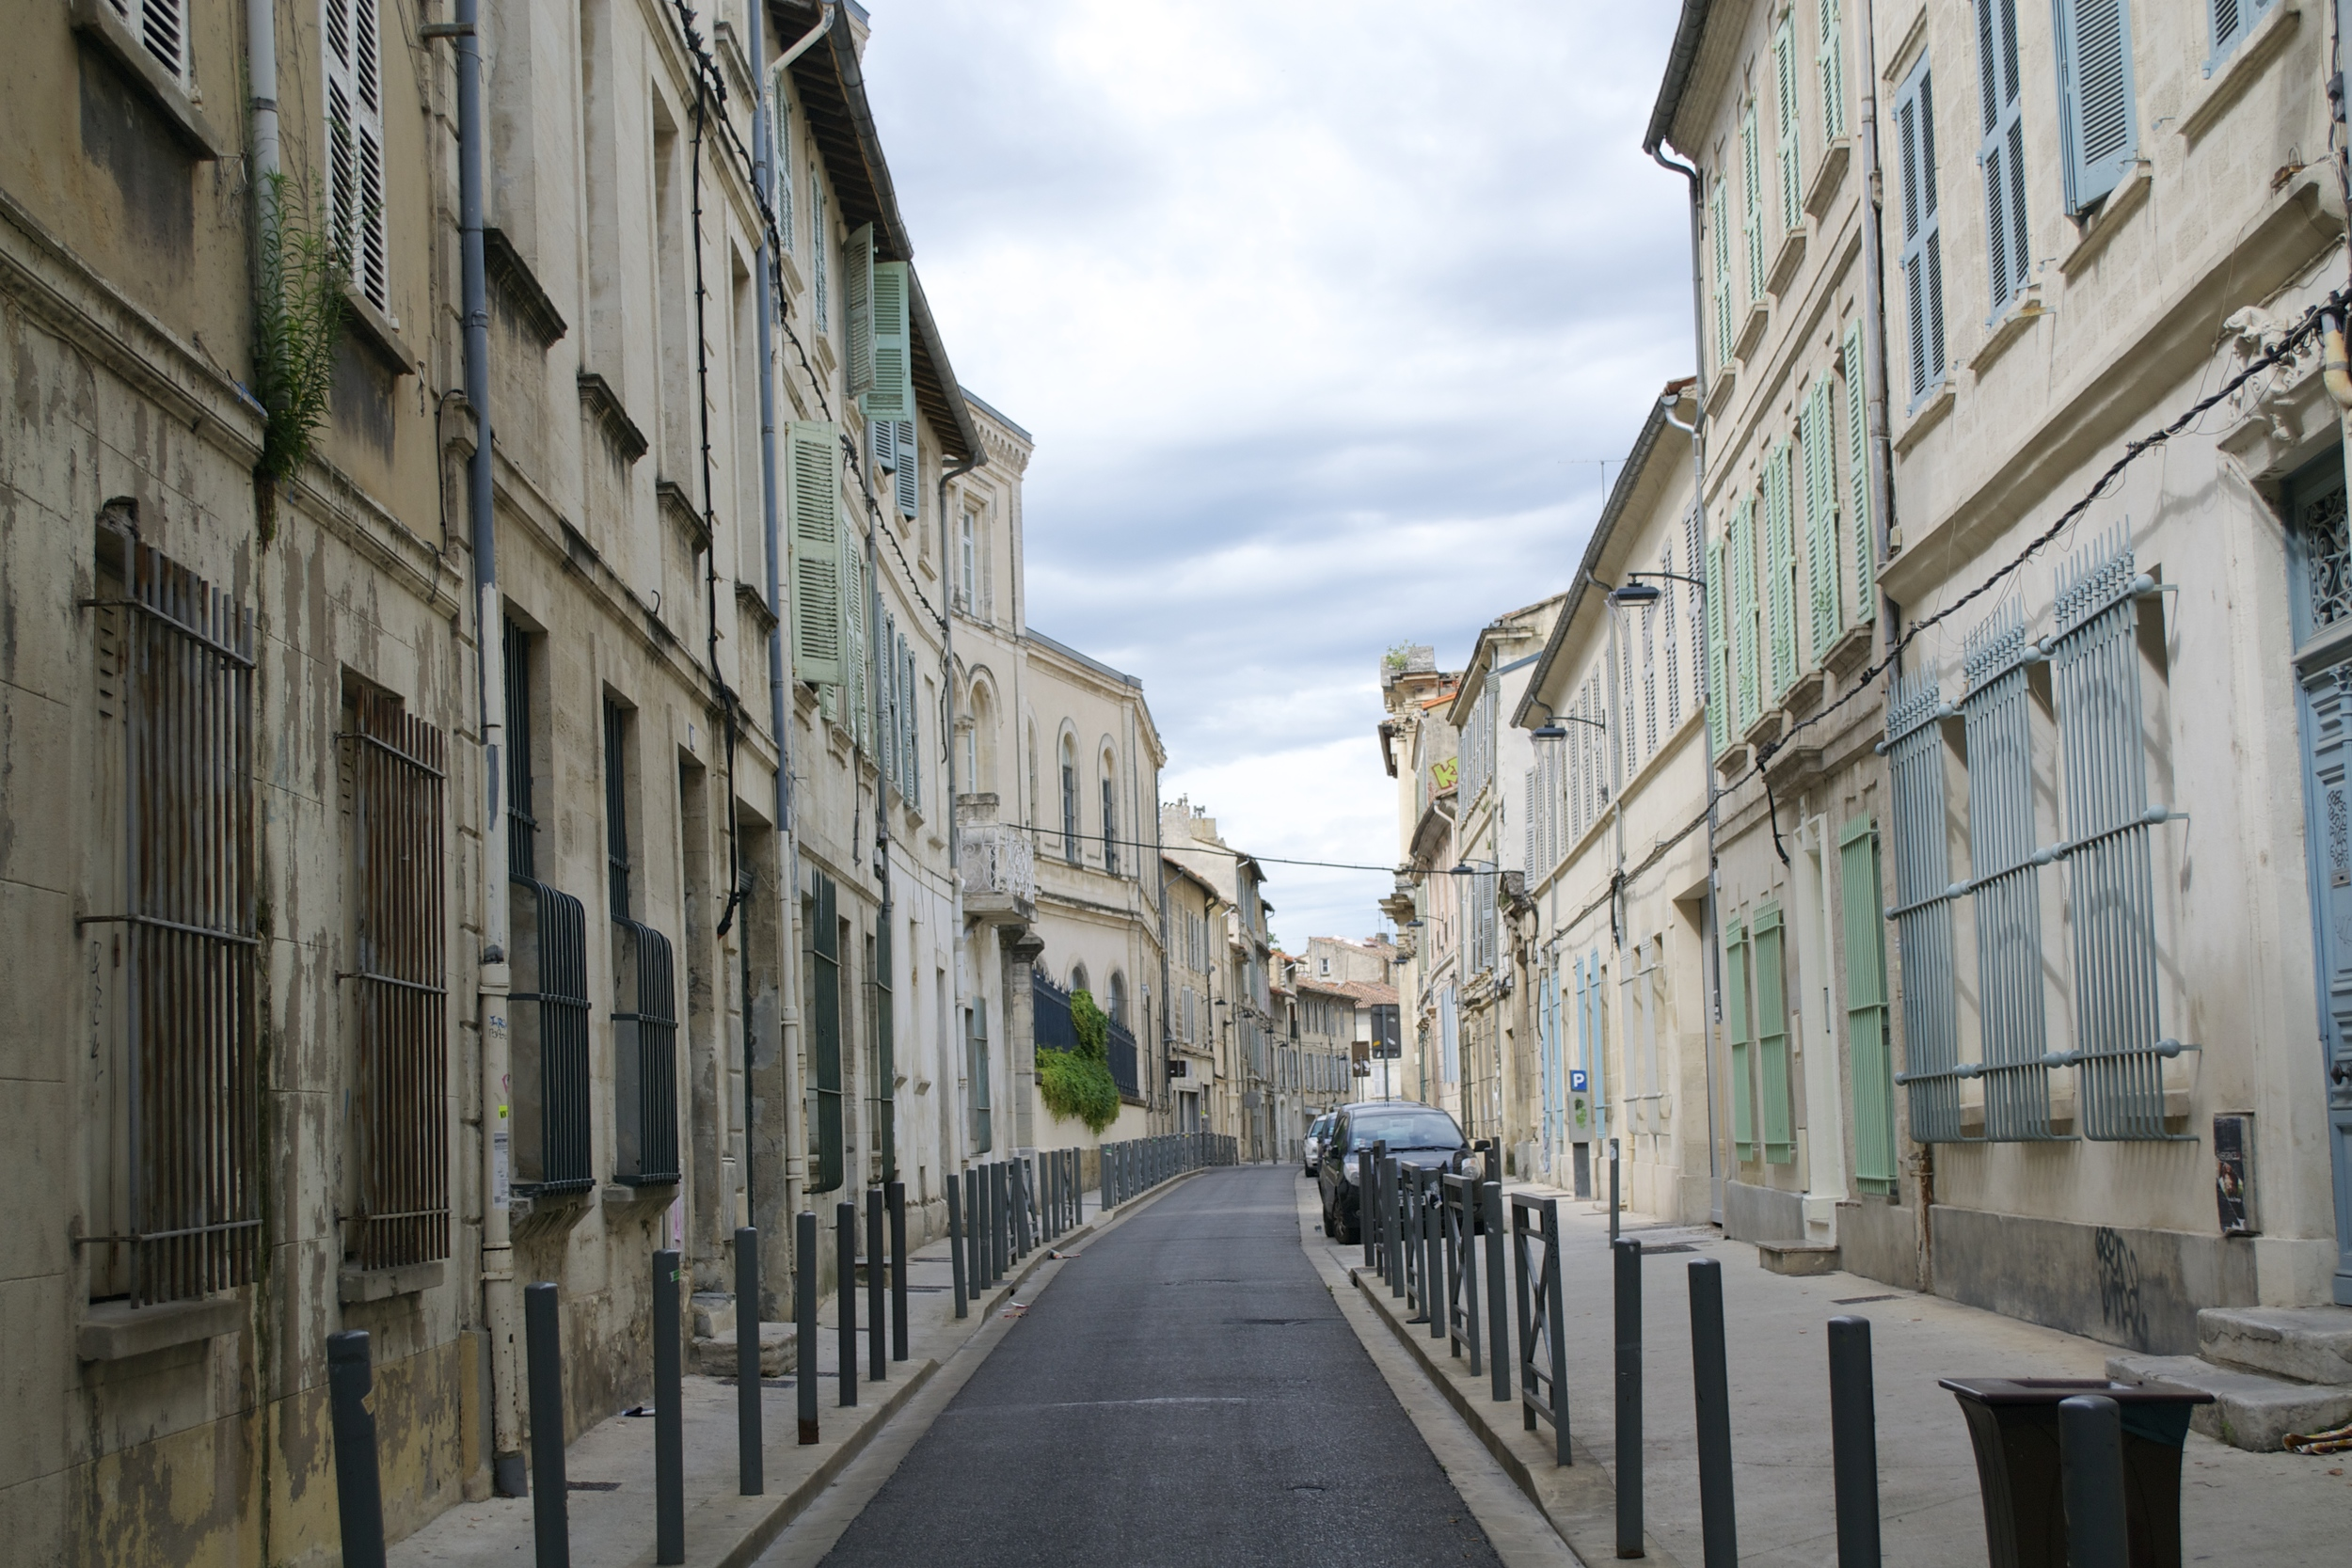 The streets of Avignon.